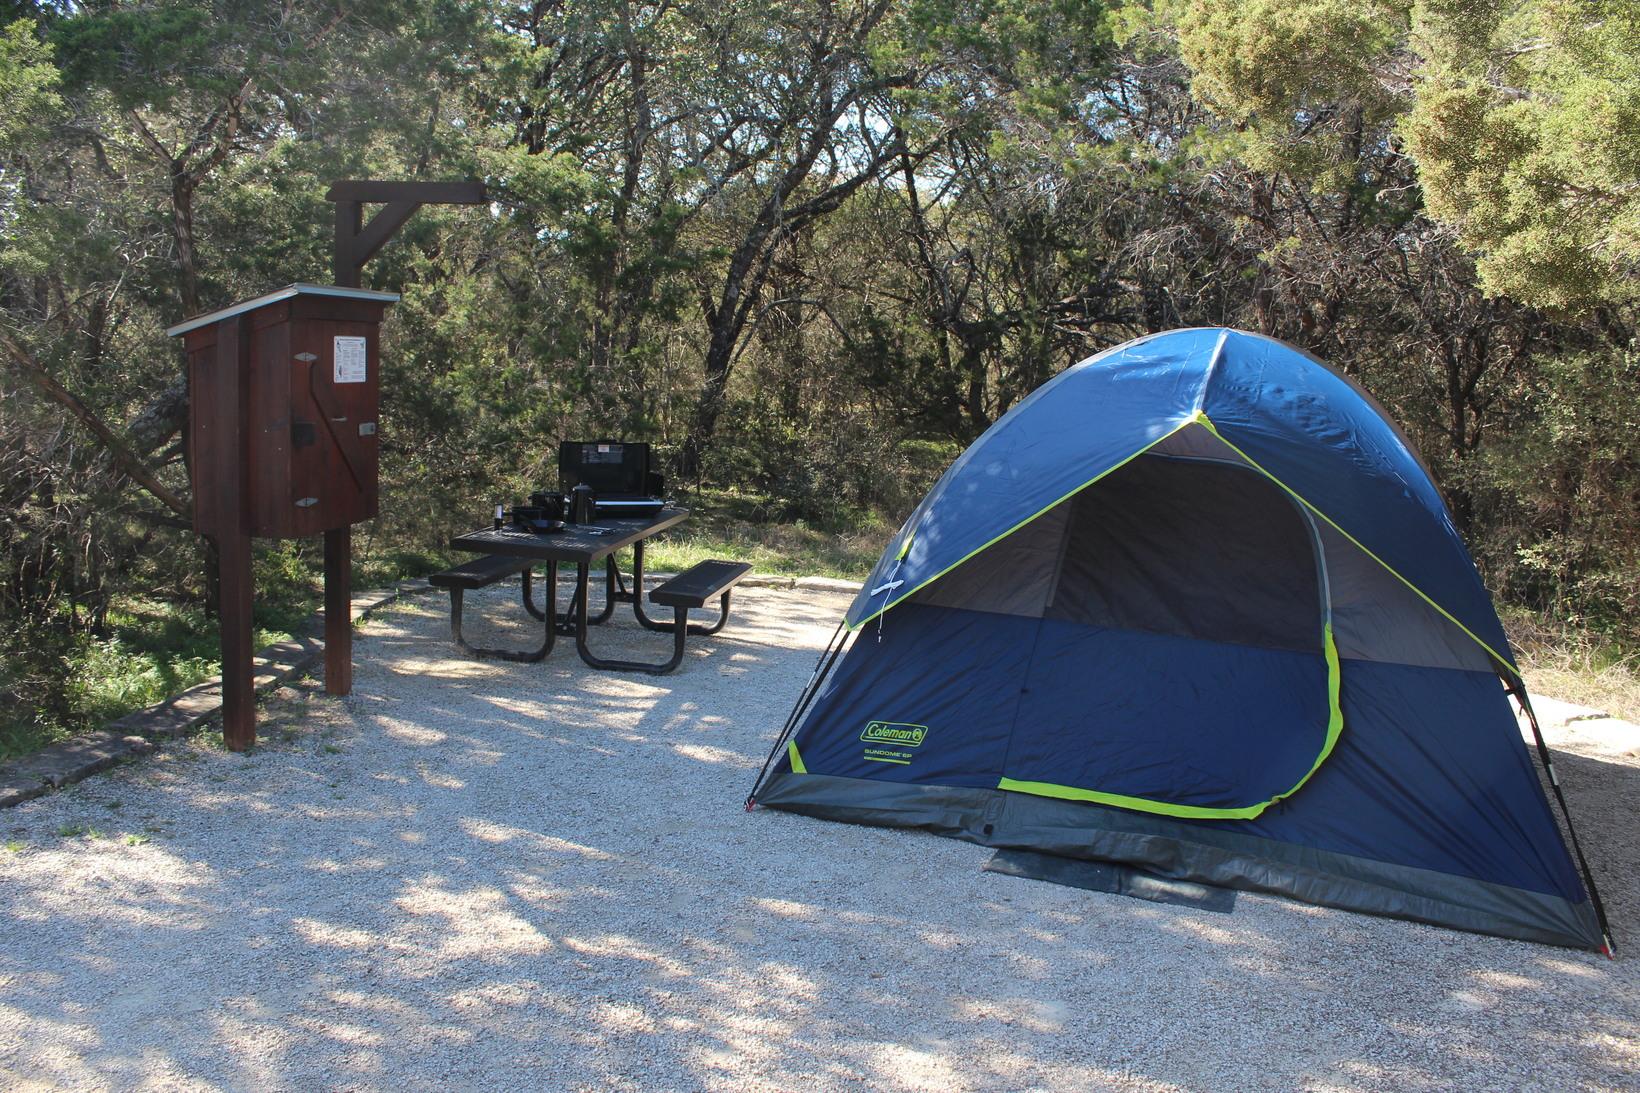 Camping Equipment Rental